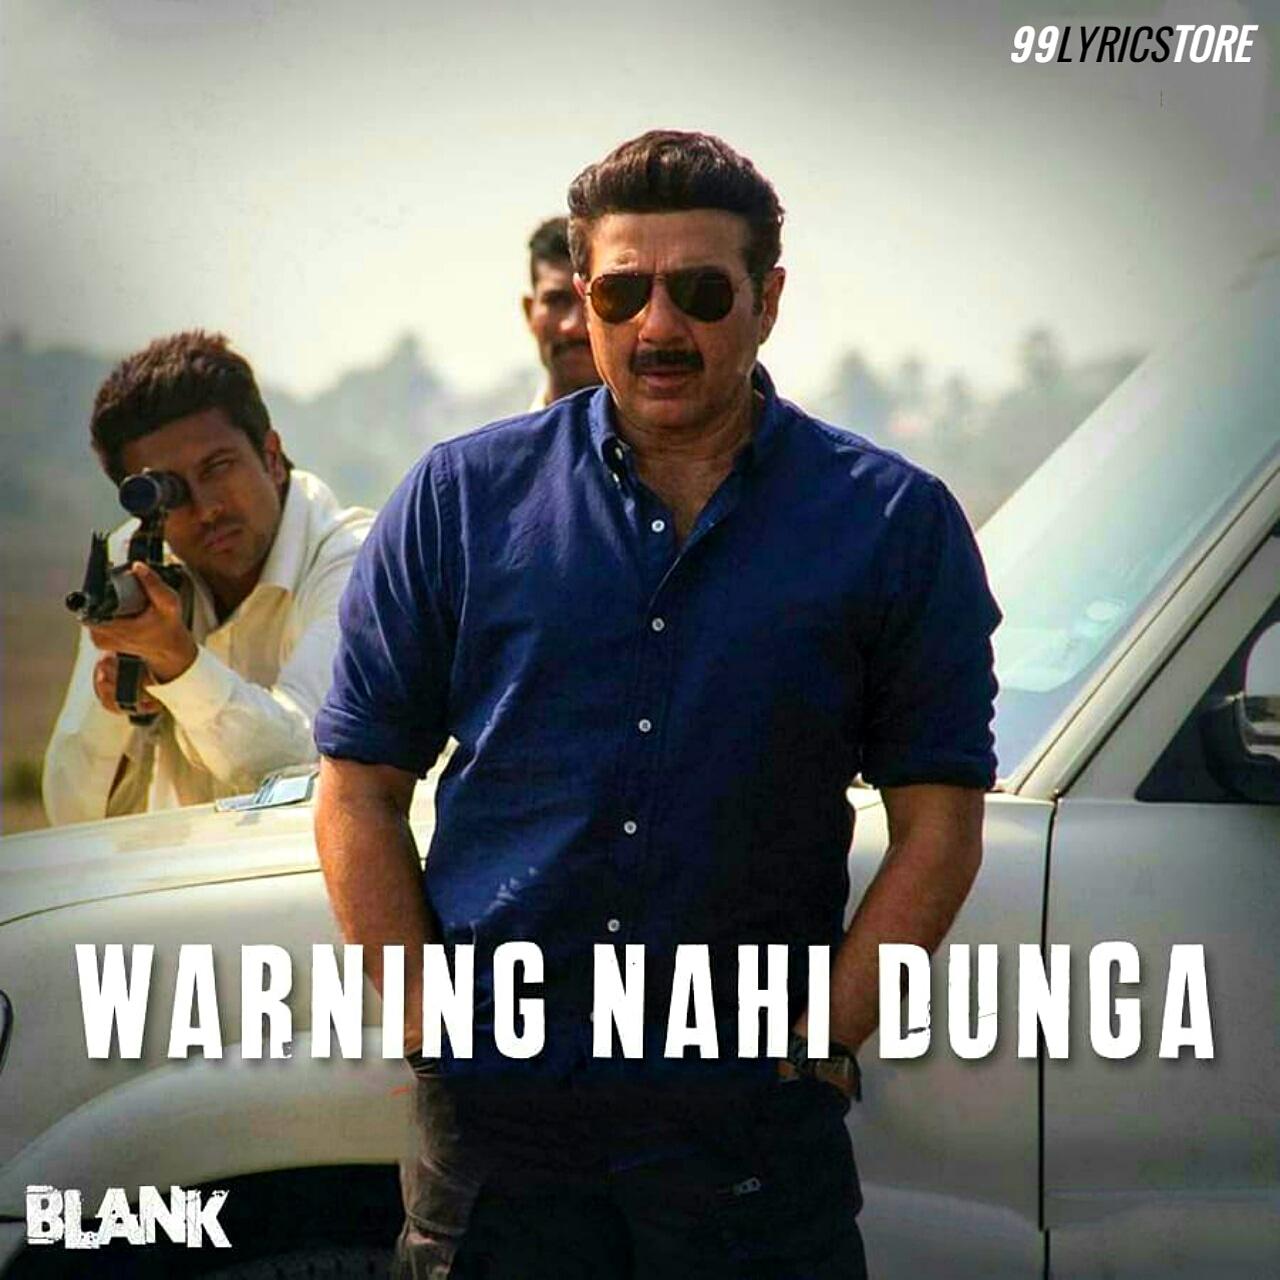 Warning Nahi Dunga Hip Hop Song Lyrics From Movie Blank